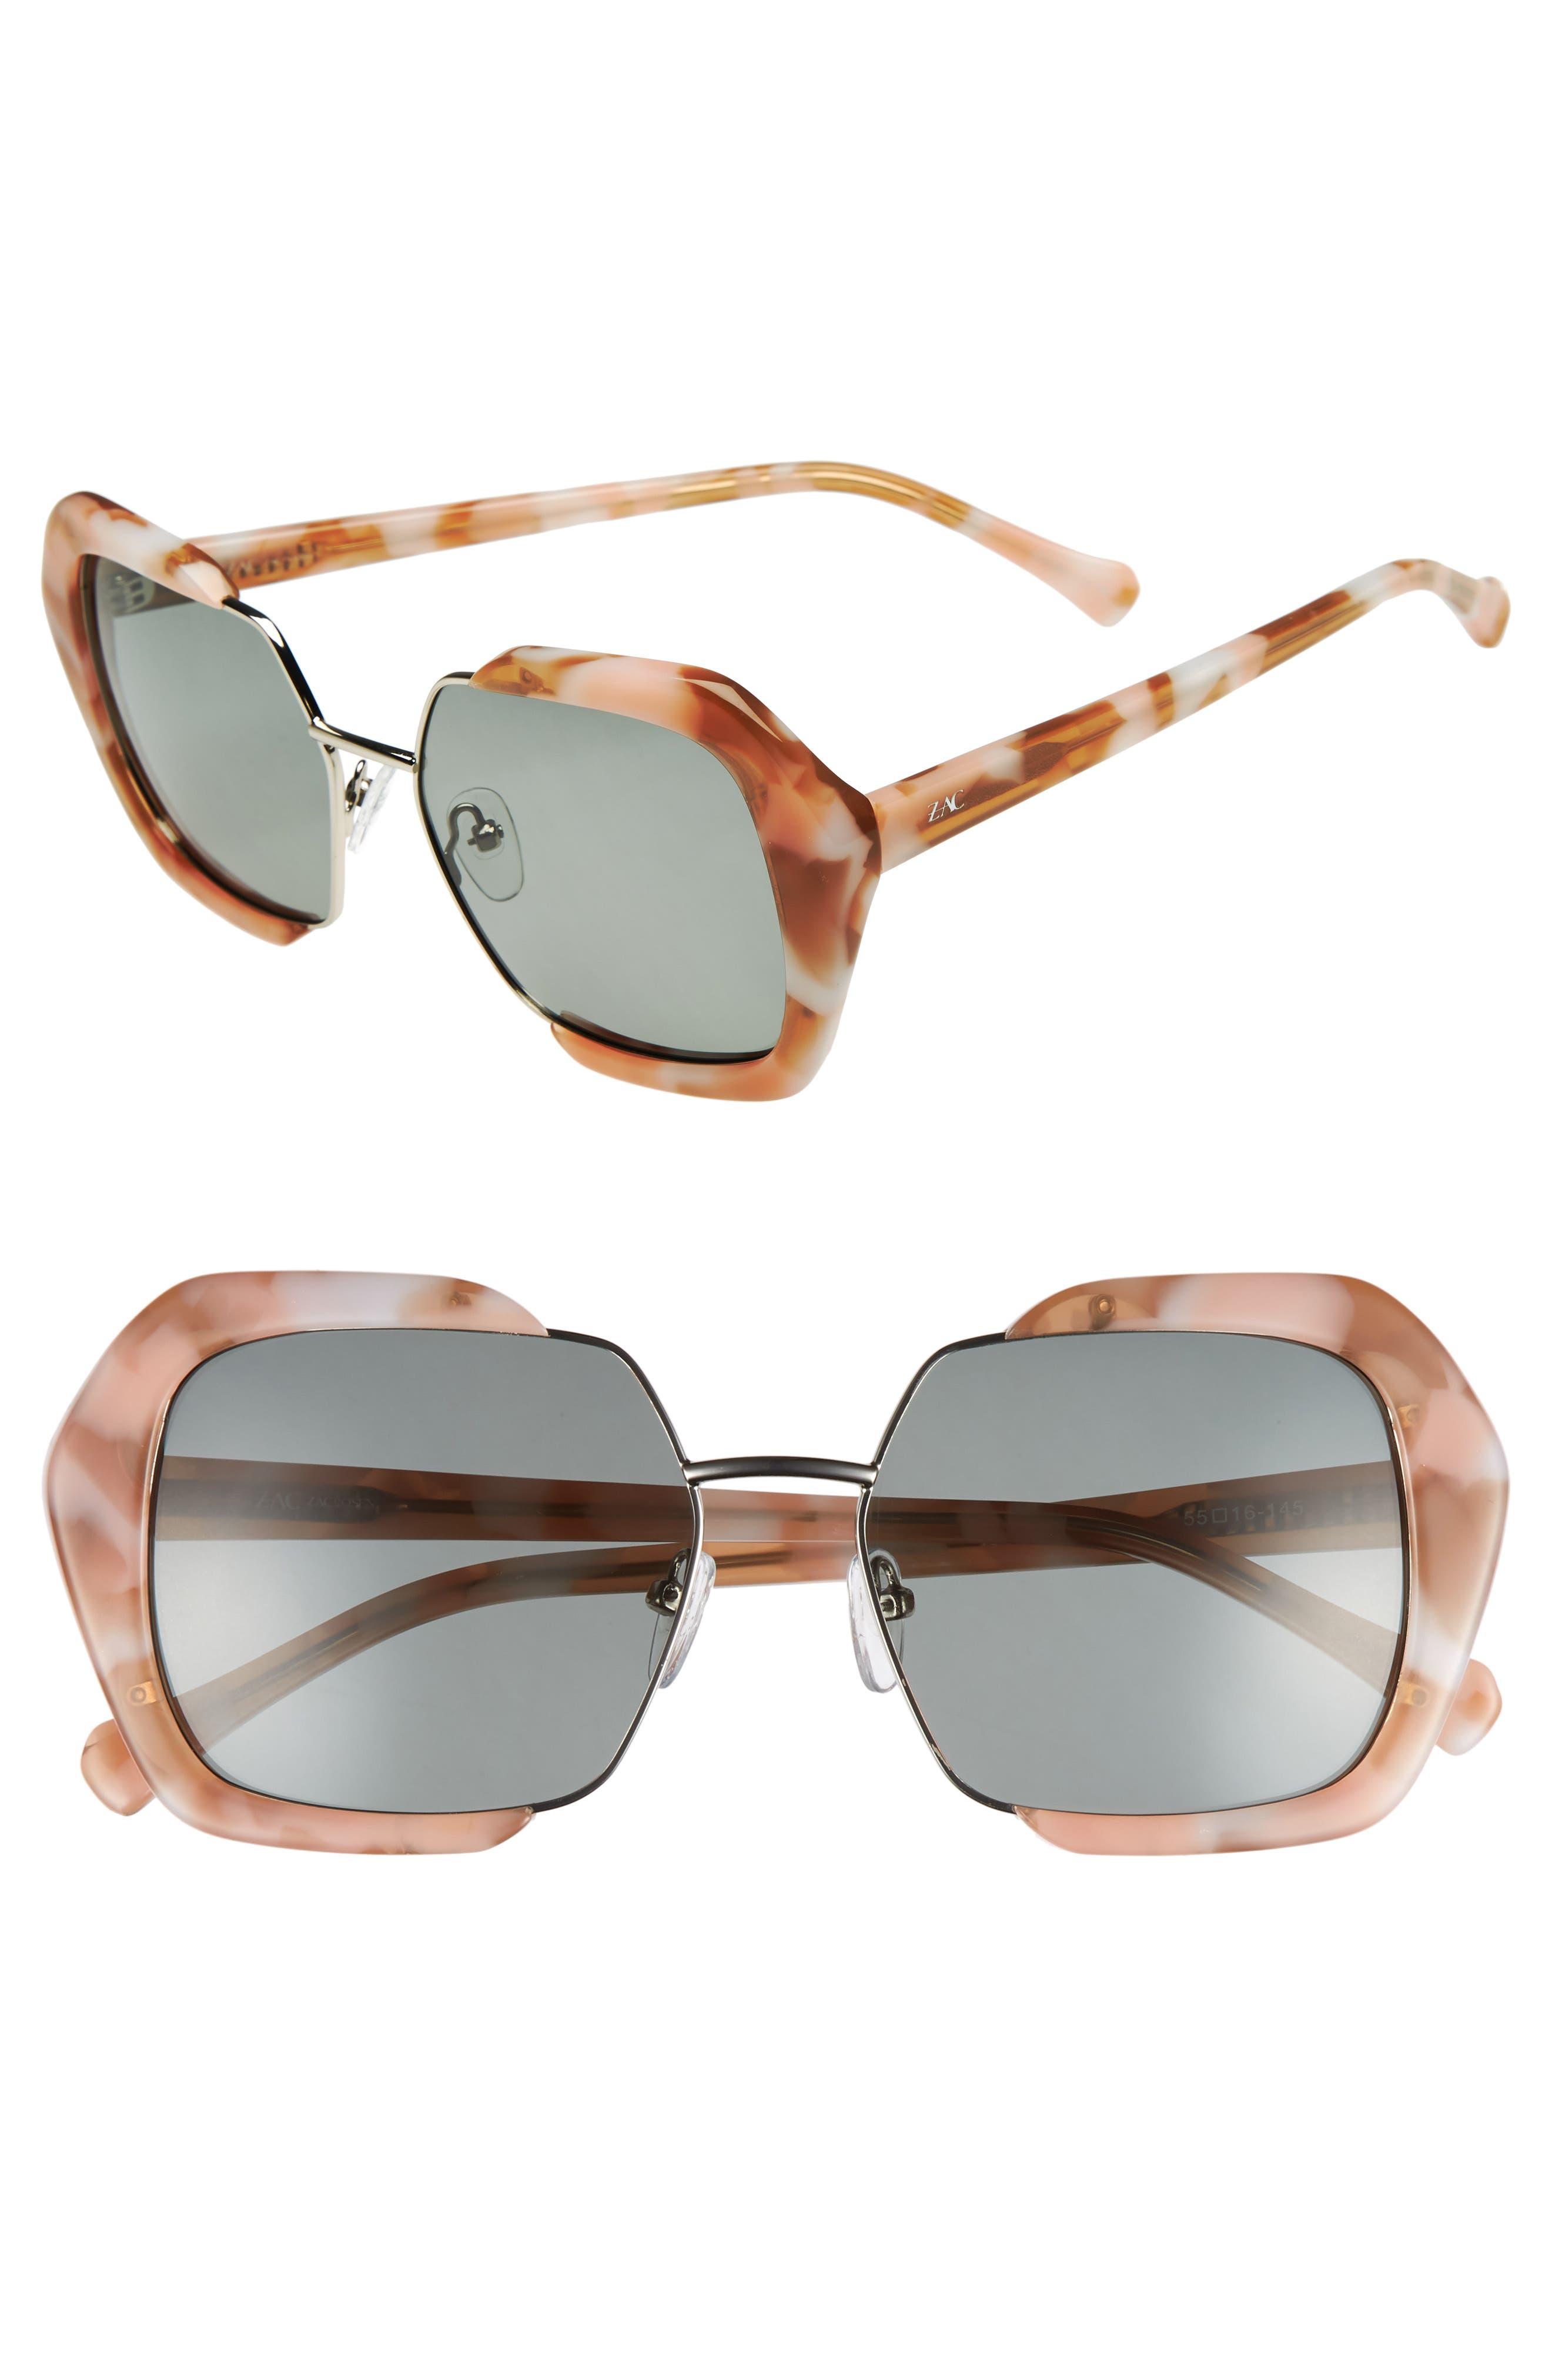 ZAC Zac Posen Isleen 55mm Polarized Sunglasses